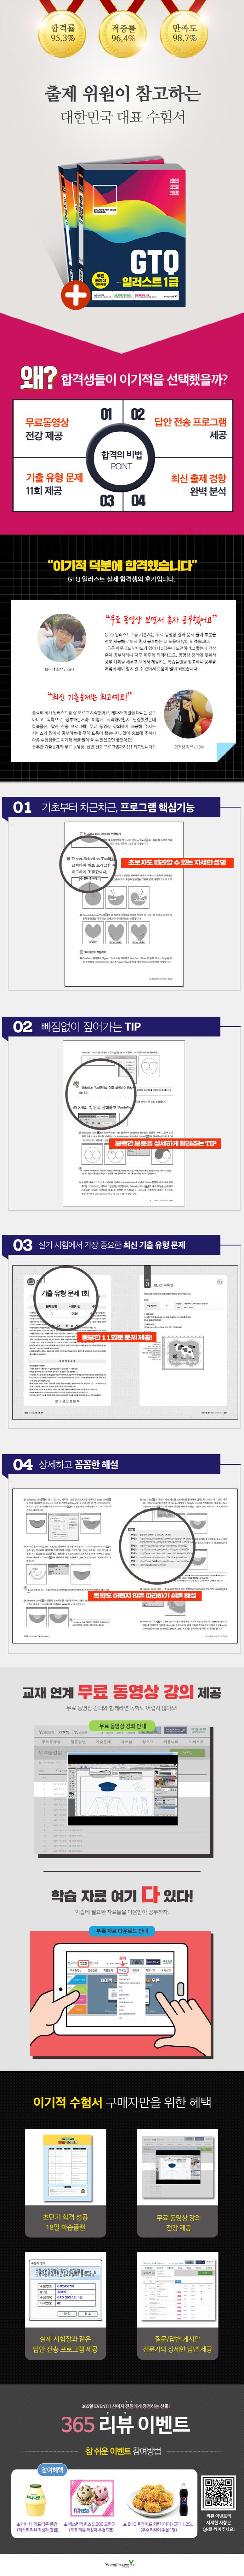 GTQ 일러스트 1급(이기적) 도서 상세이미지